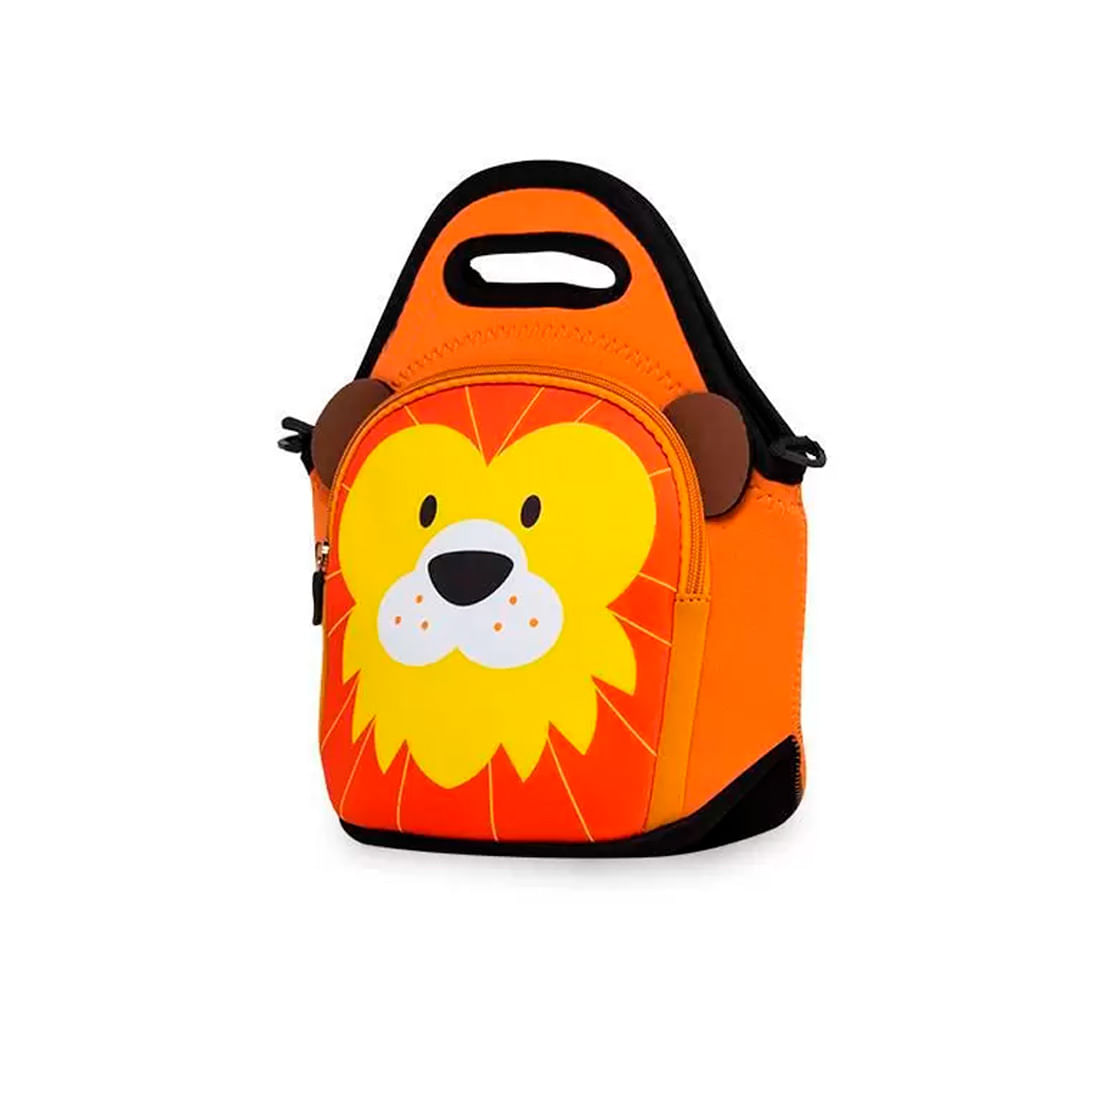 Lancheira-Infantil-Neoprene-Zoo--UN--9097--VER21-